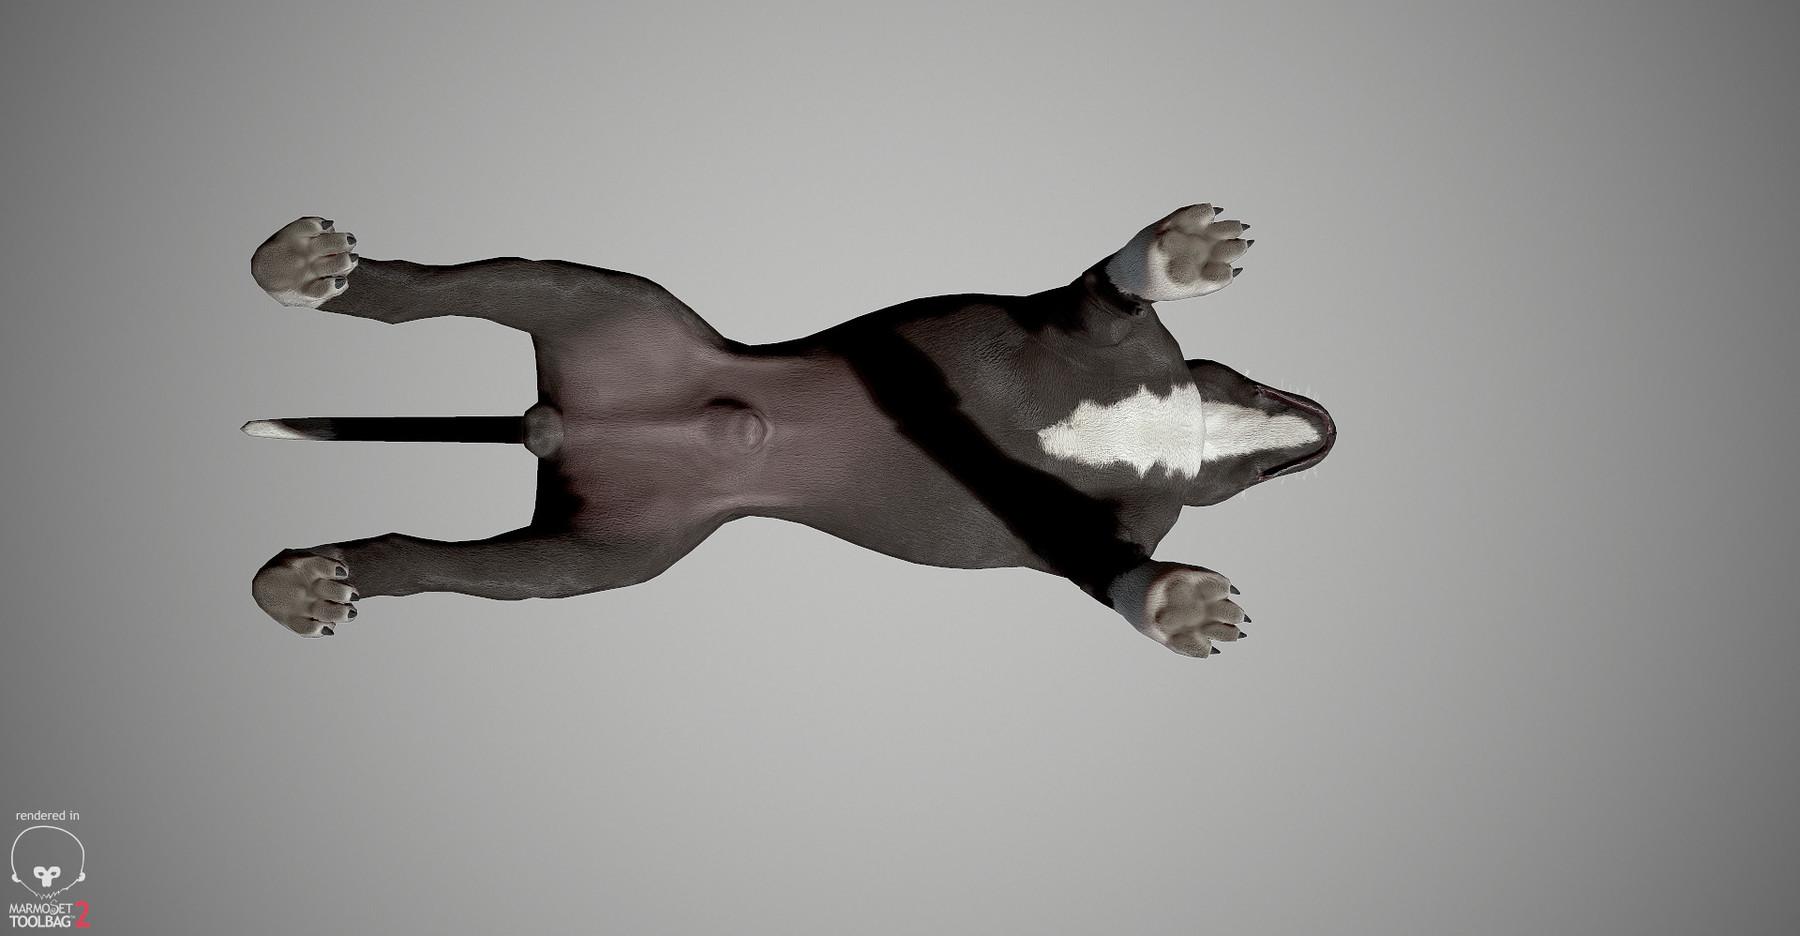 Pitbull by alexlashk marmoset 12